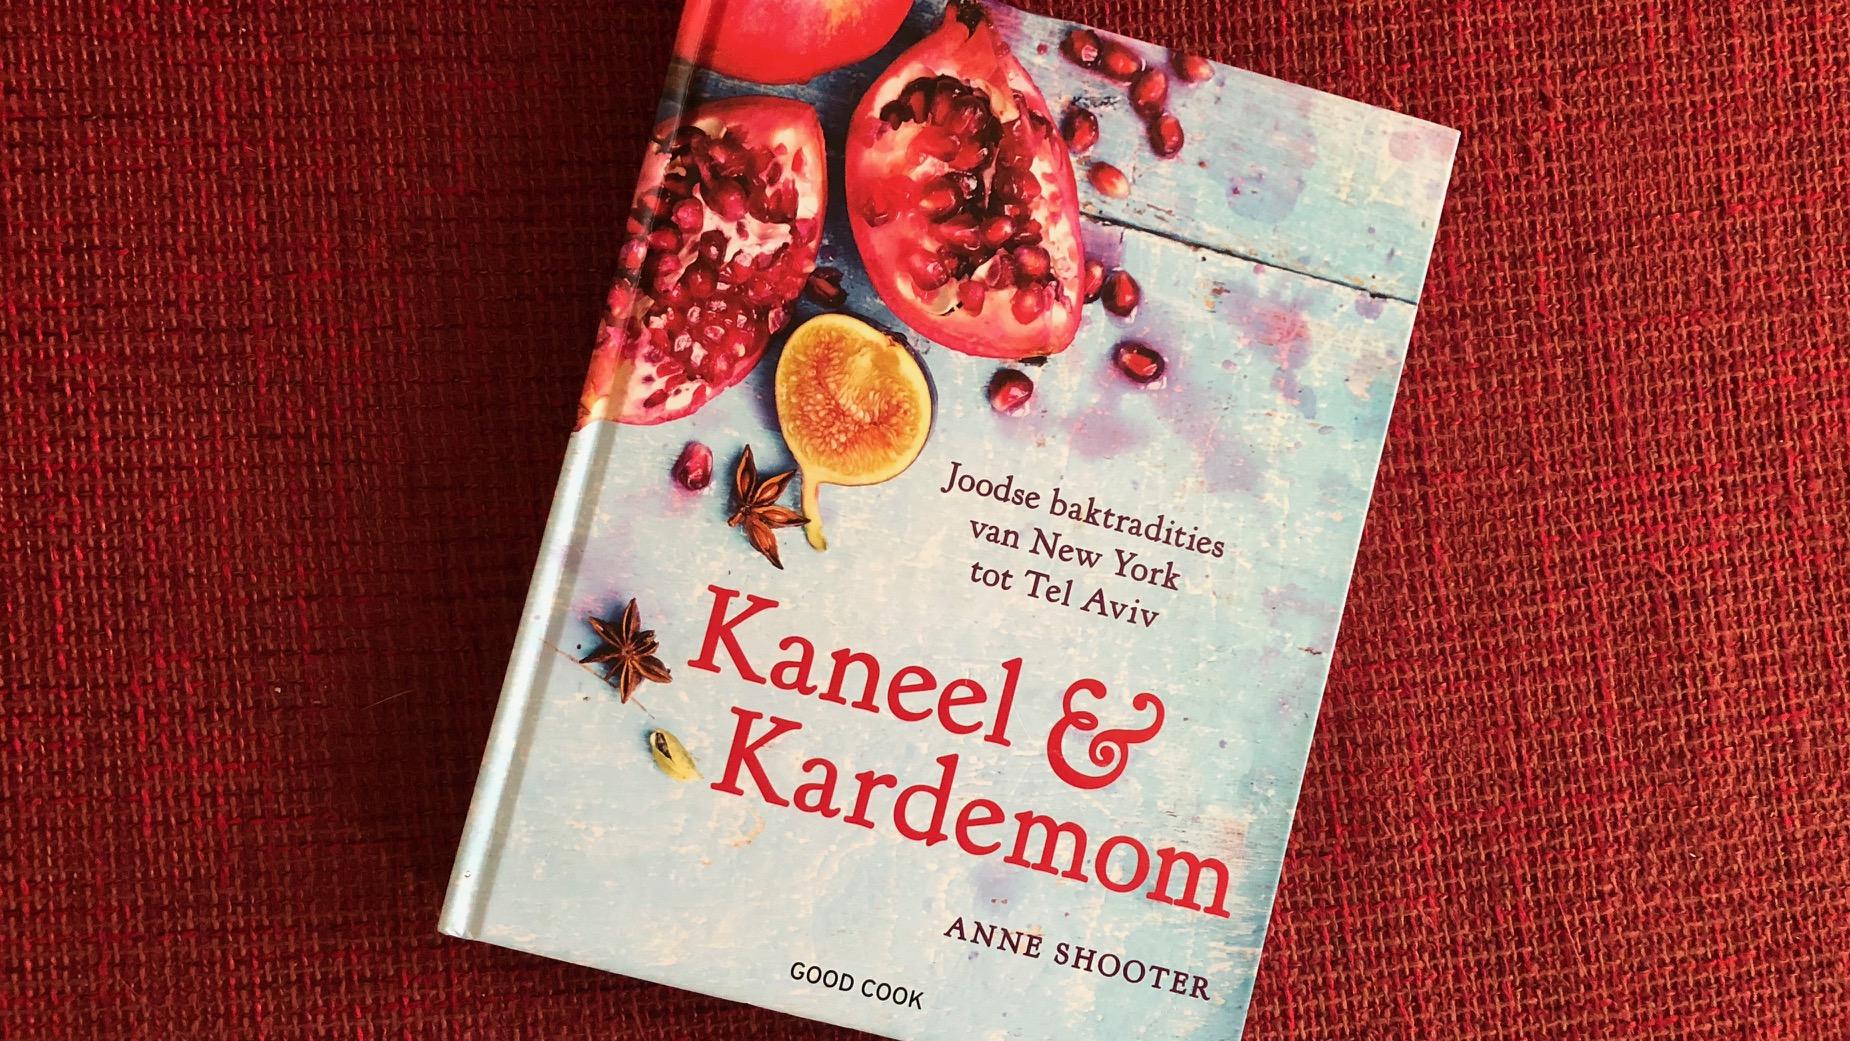 Anne Shooter: Kaneel & Kardemom